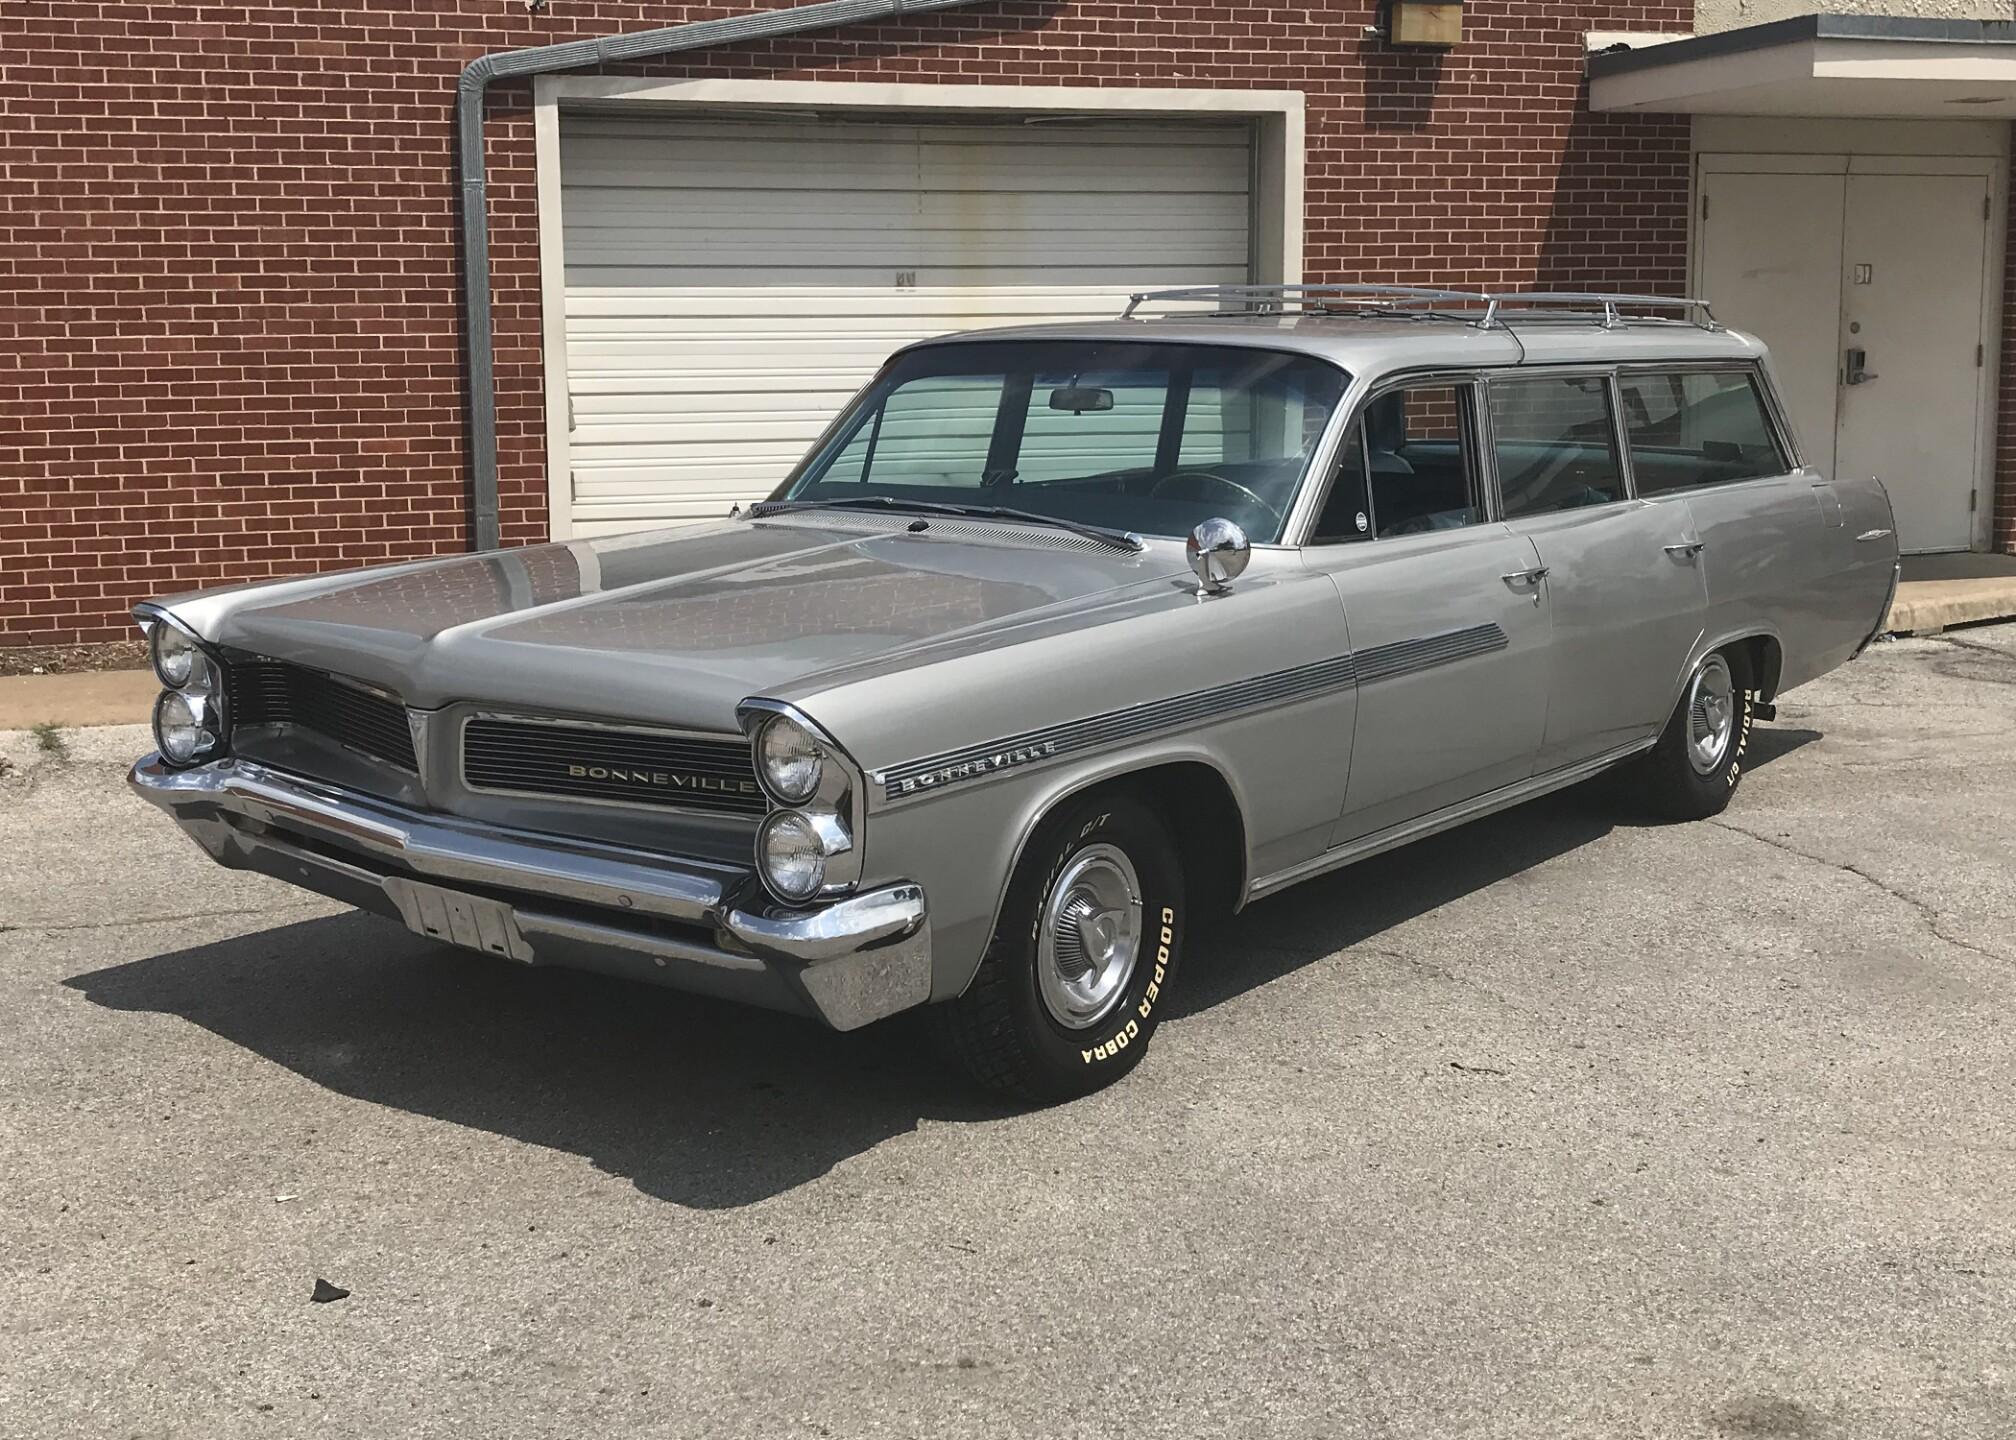 1963 Pontiac Bonneville.jpg